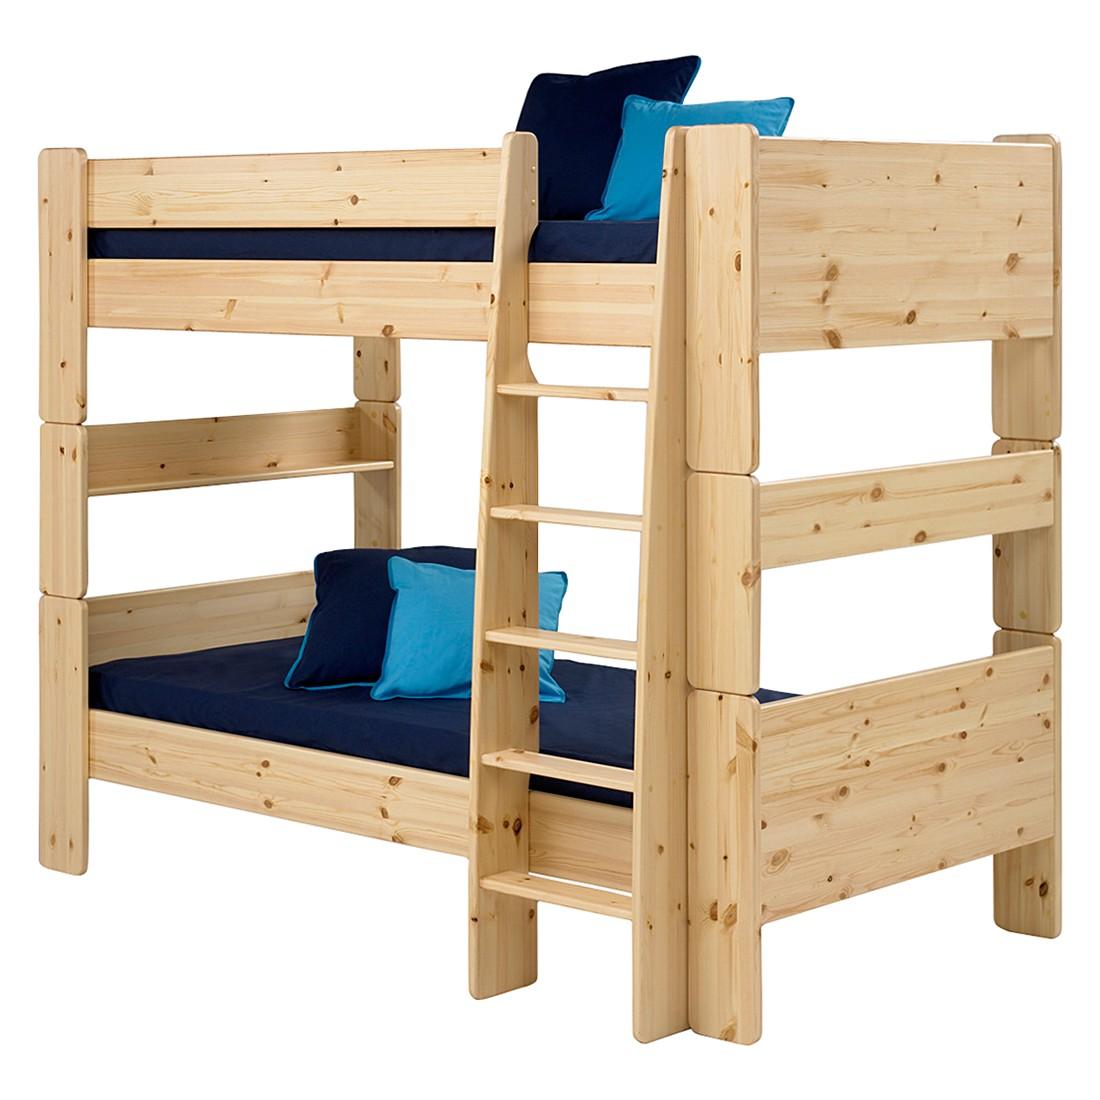 home24 Etagenbett Steens for Kids | Kinderzimmer > Kinderbetten > Etagenbetten | Steens